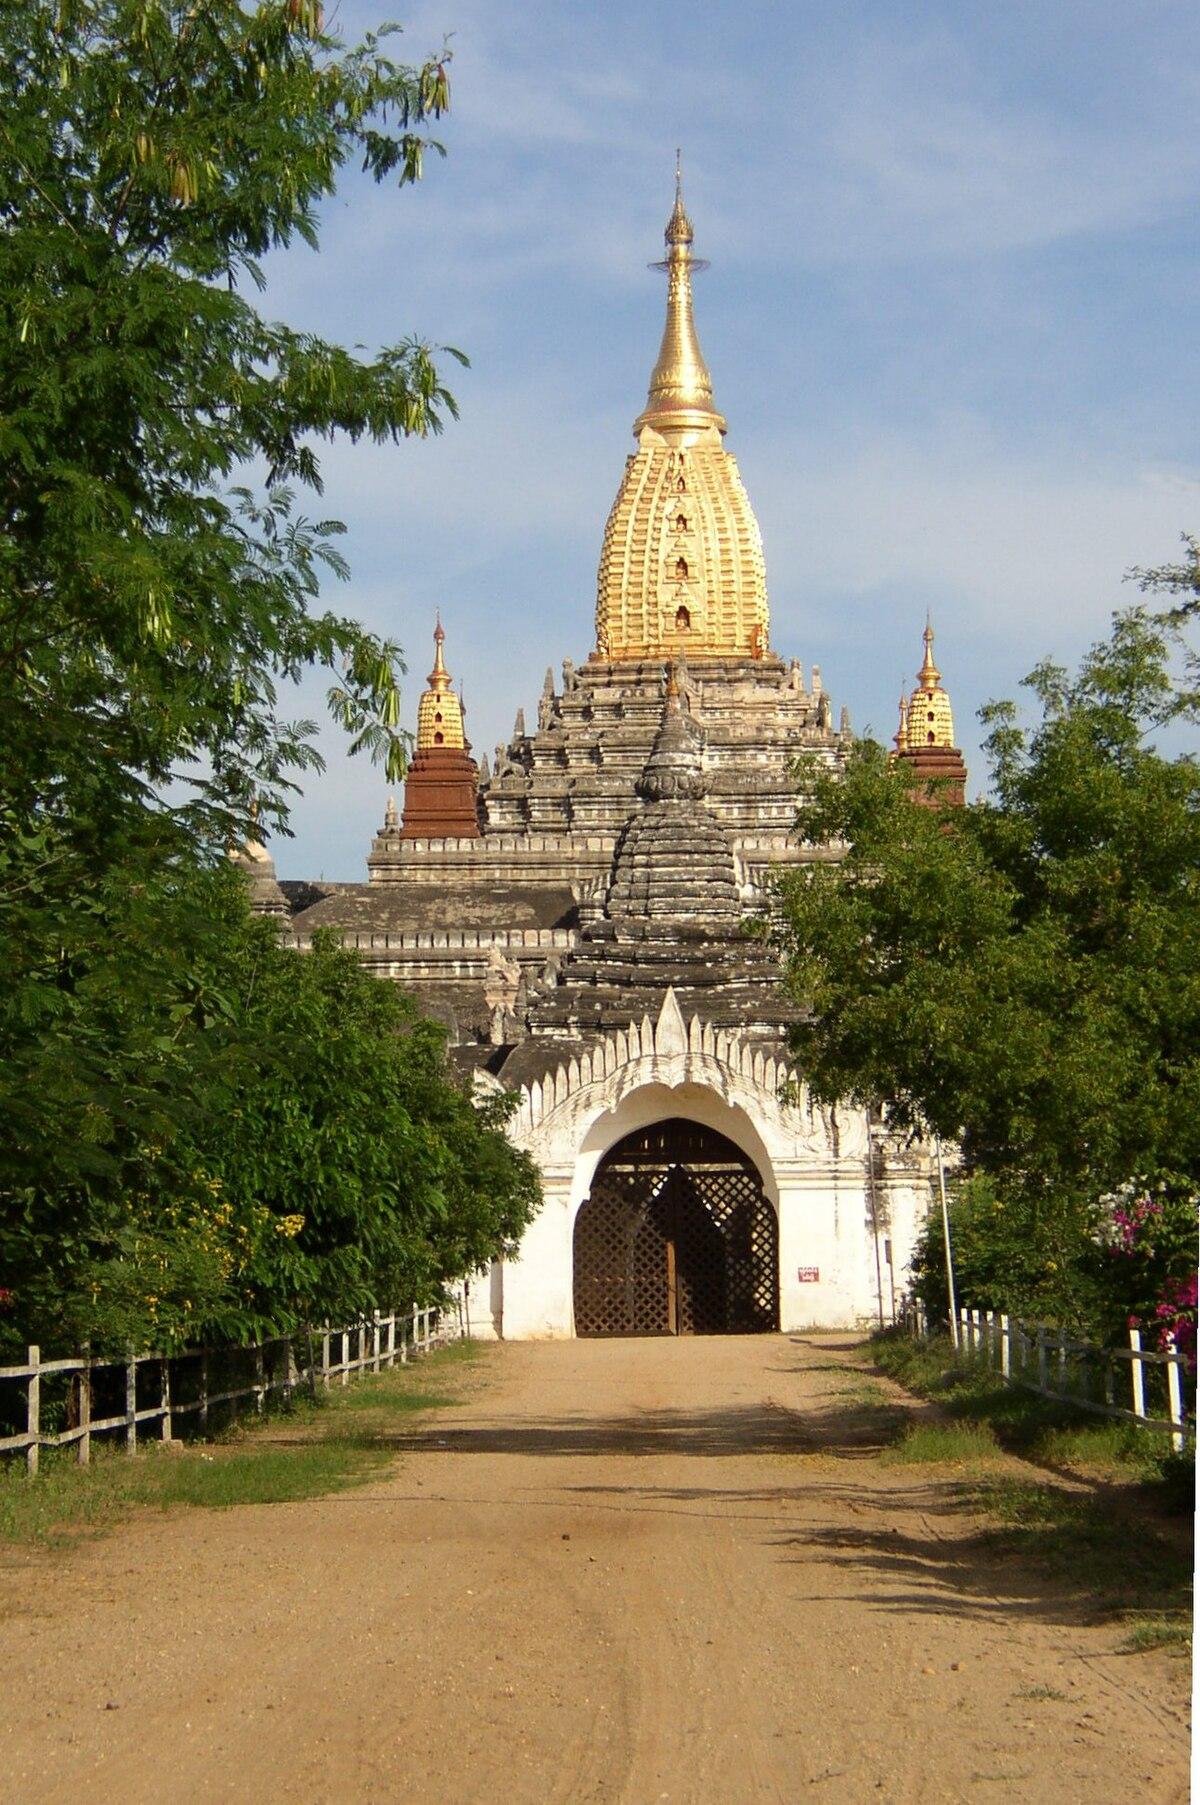 Ananda Temple - Wikipedia